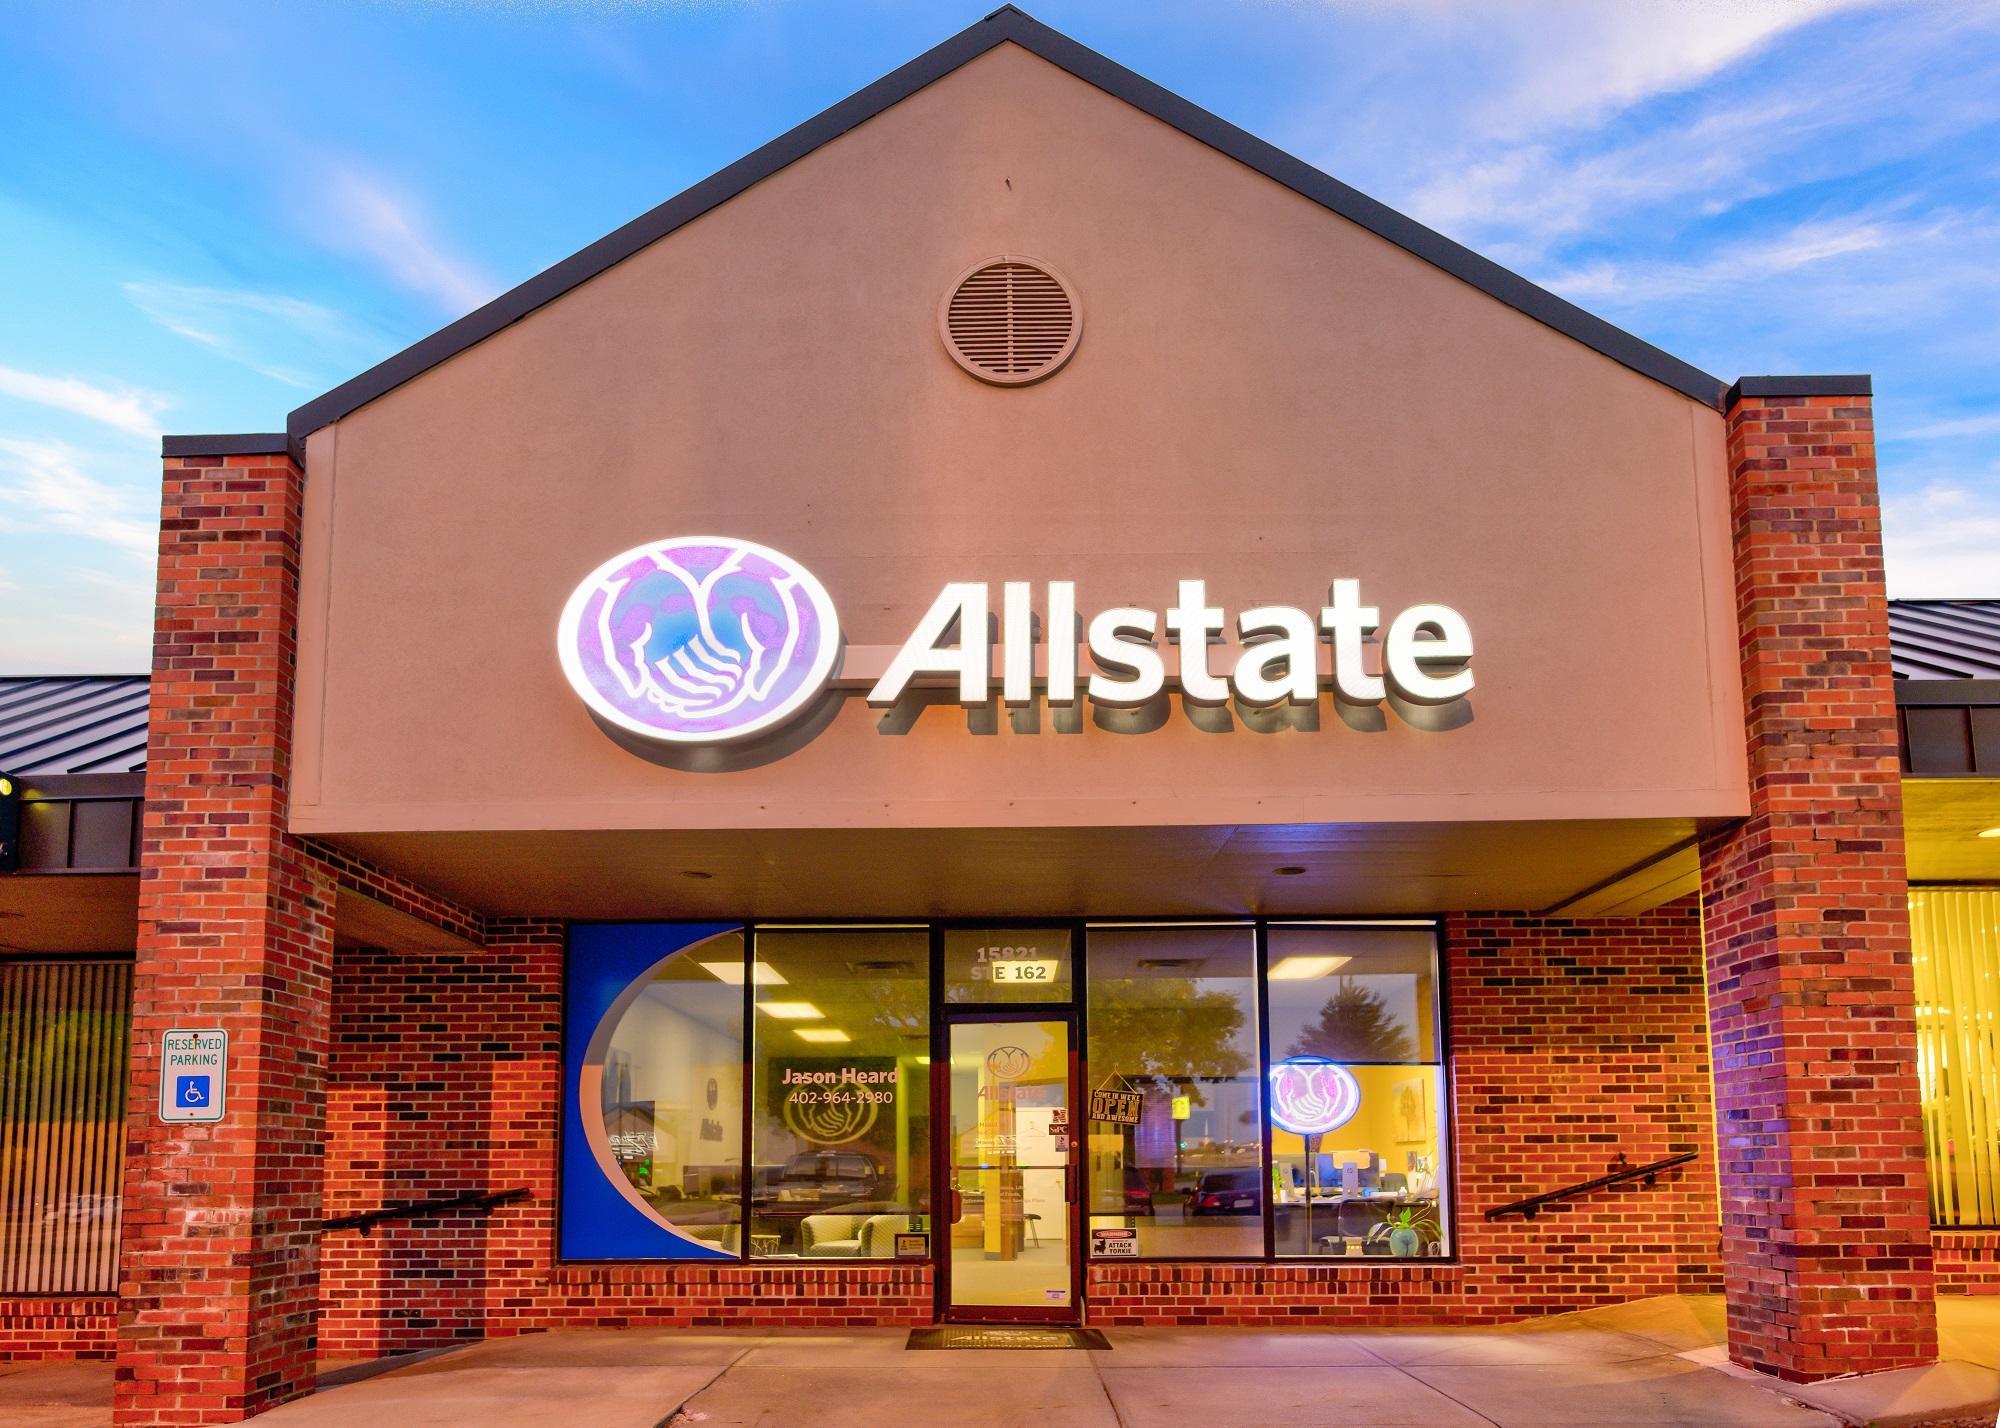 allstate car insurance in omaha ne jason heard. Black Bedroom Furniture Sets. Home Design Ideas